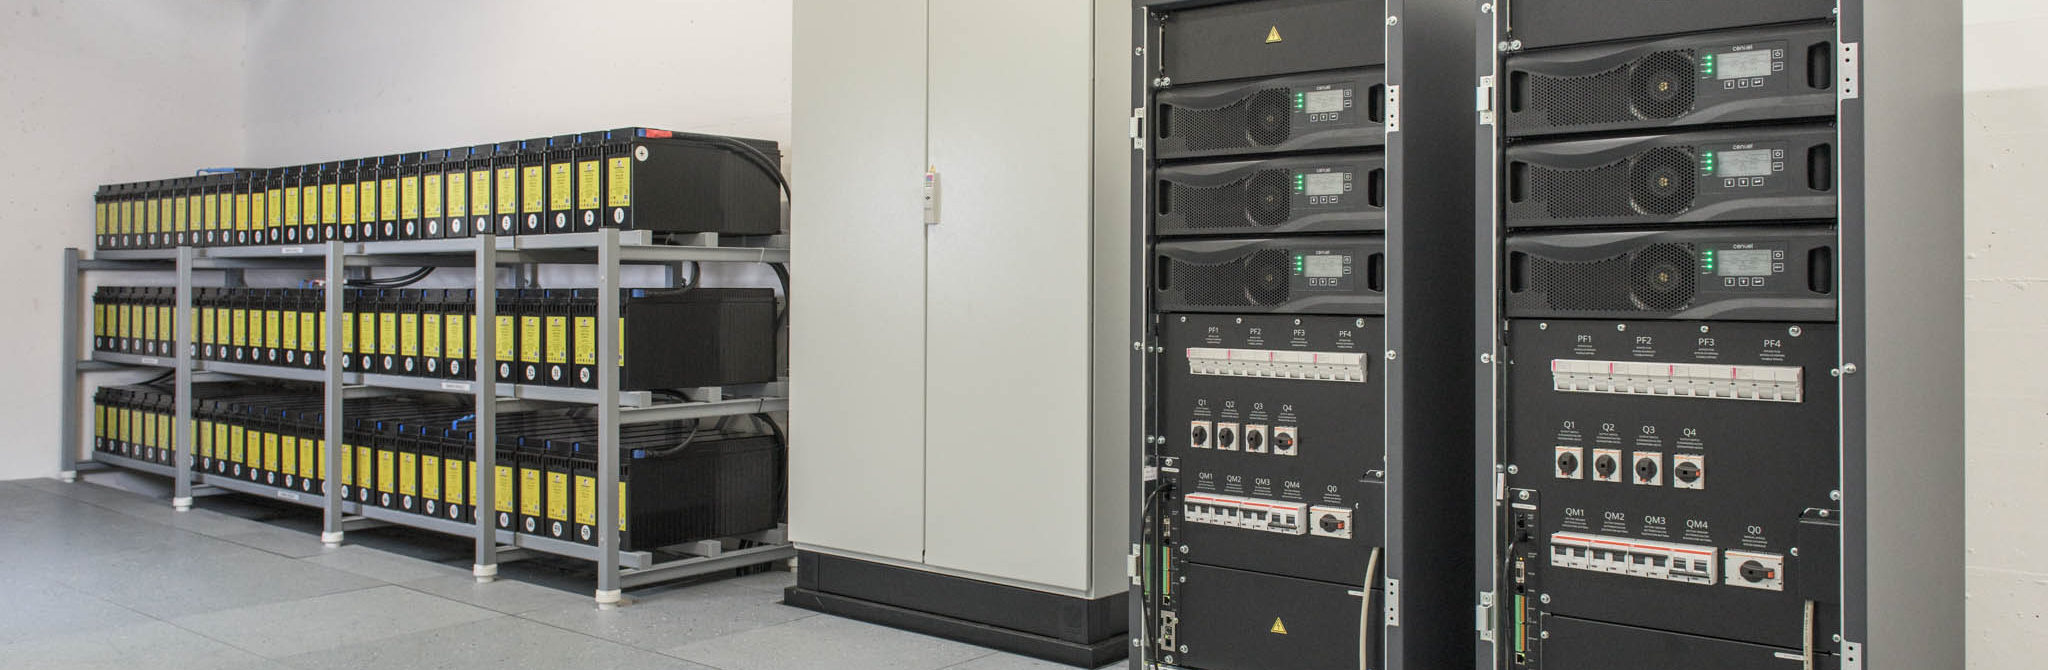 SB1F Système UPS